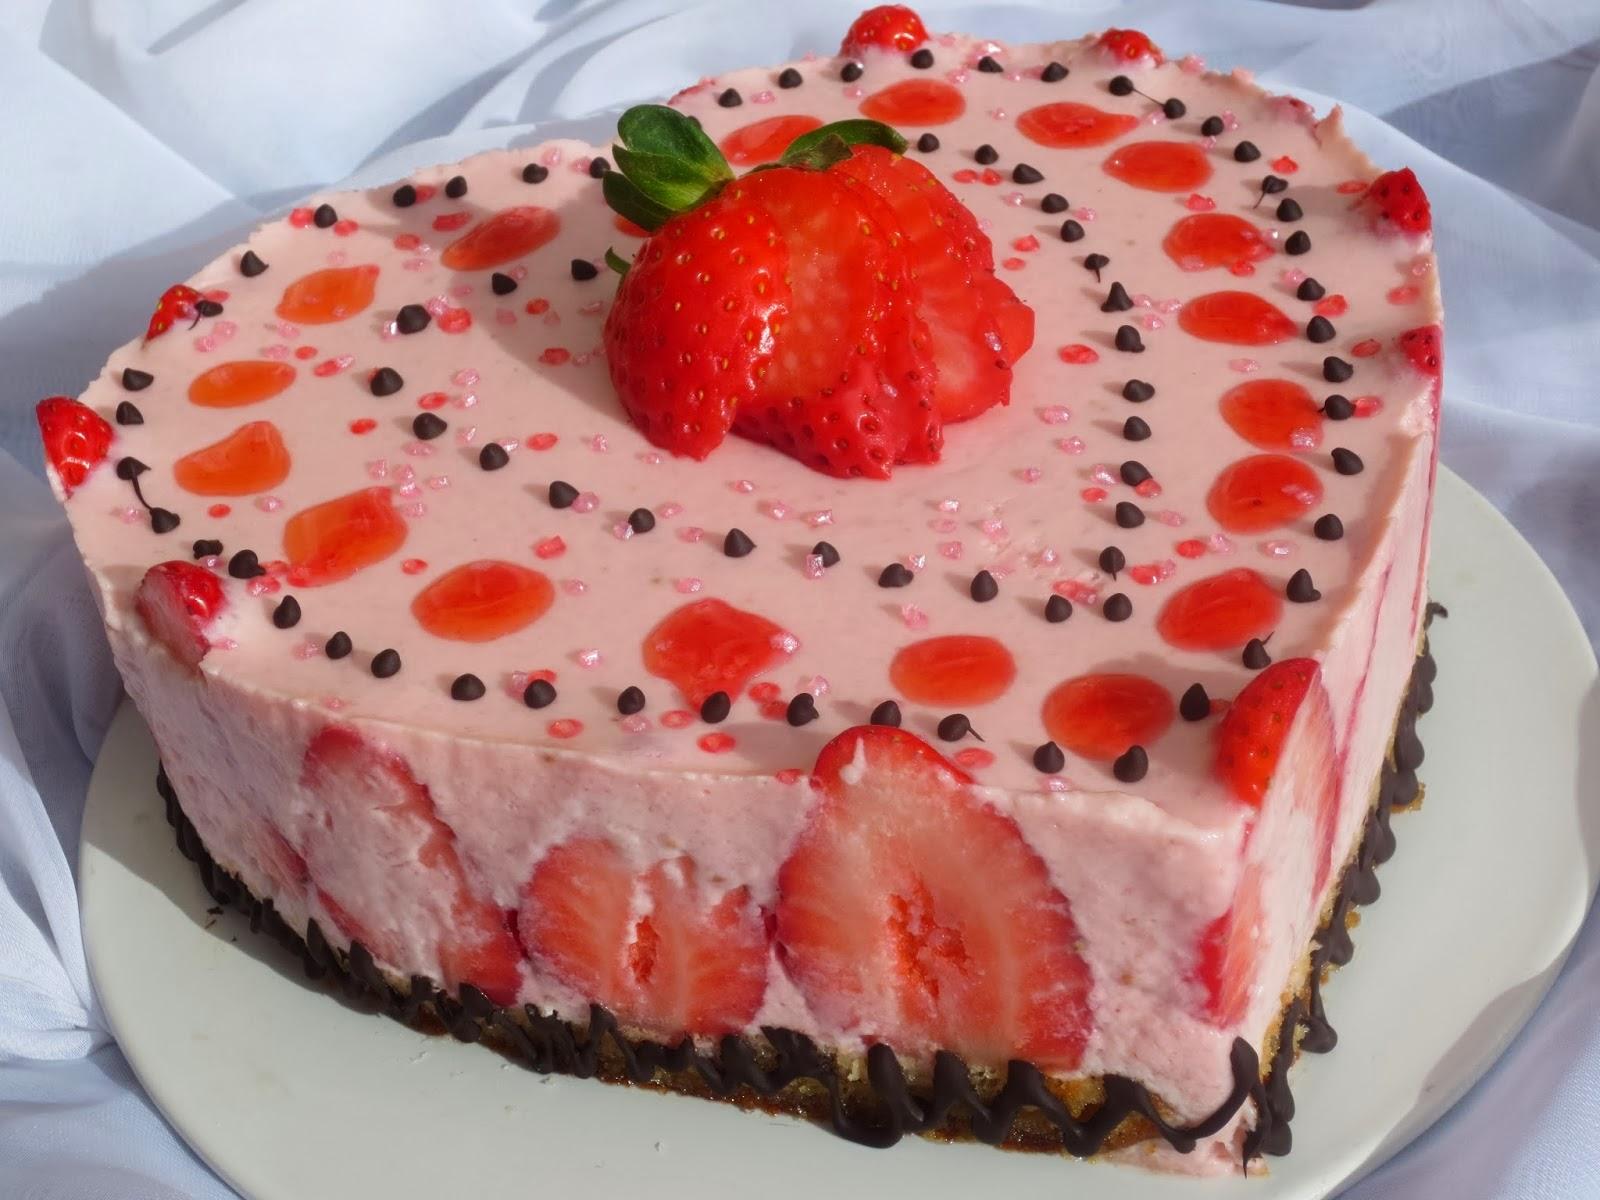 Tarta de fresa y yogur